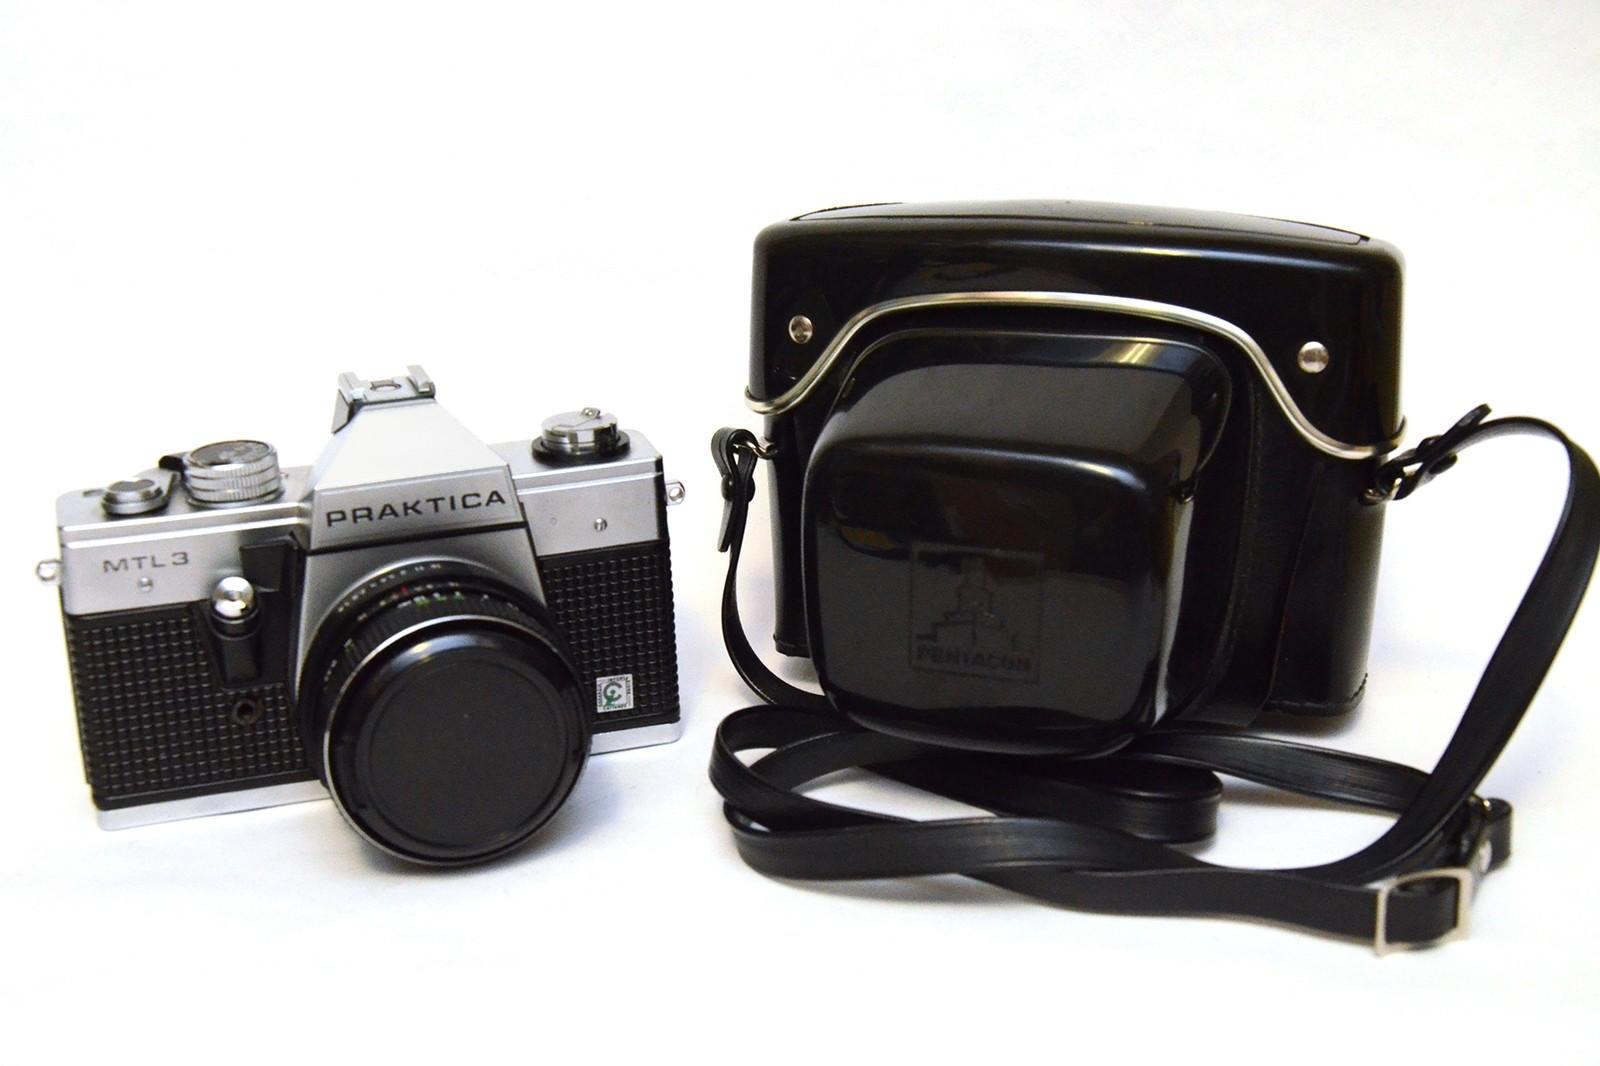 Praktica mtl with pentacon auto mm f camera in